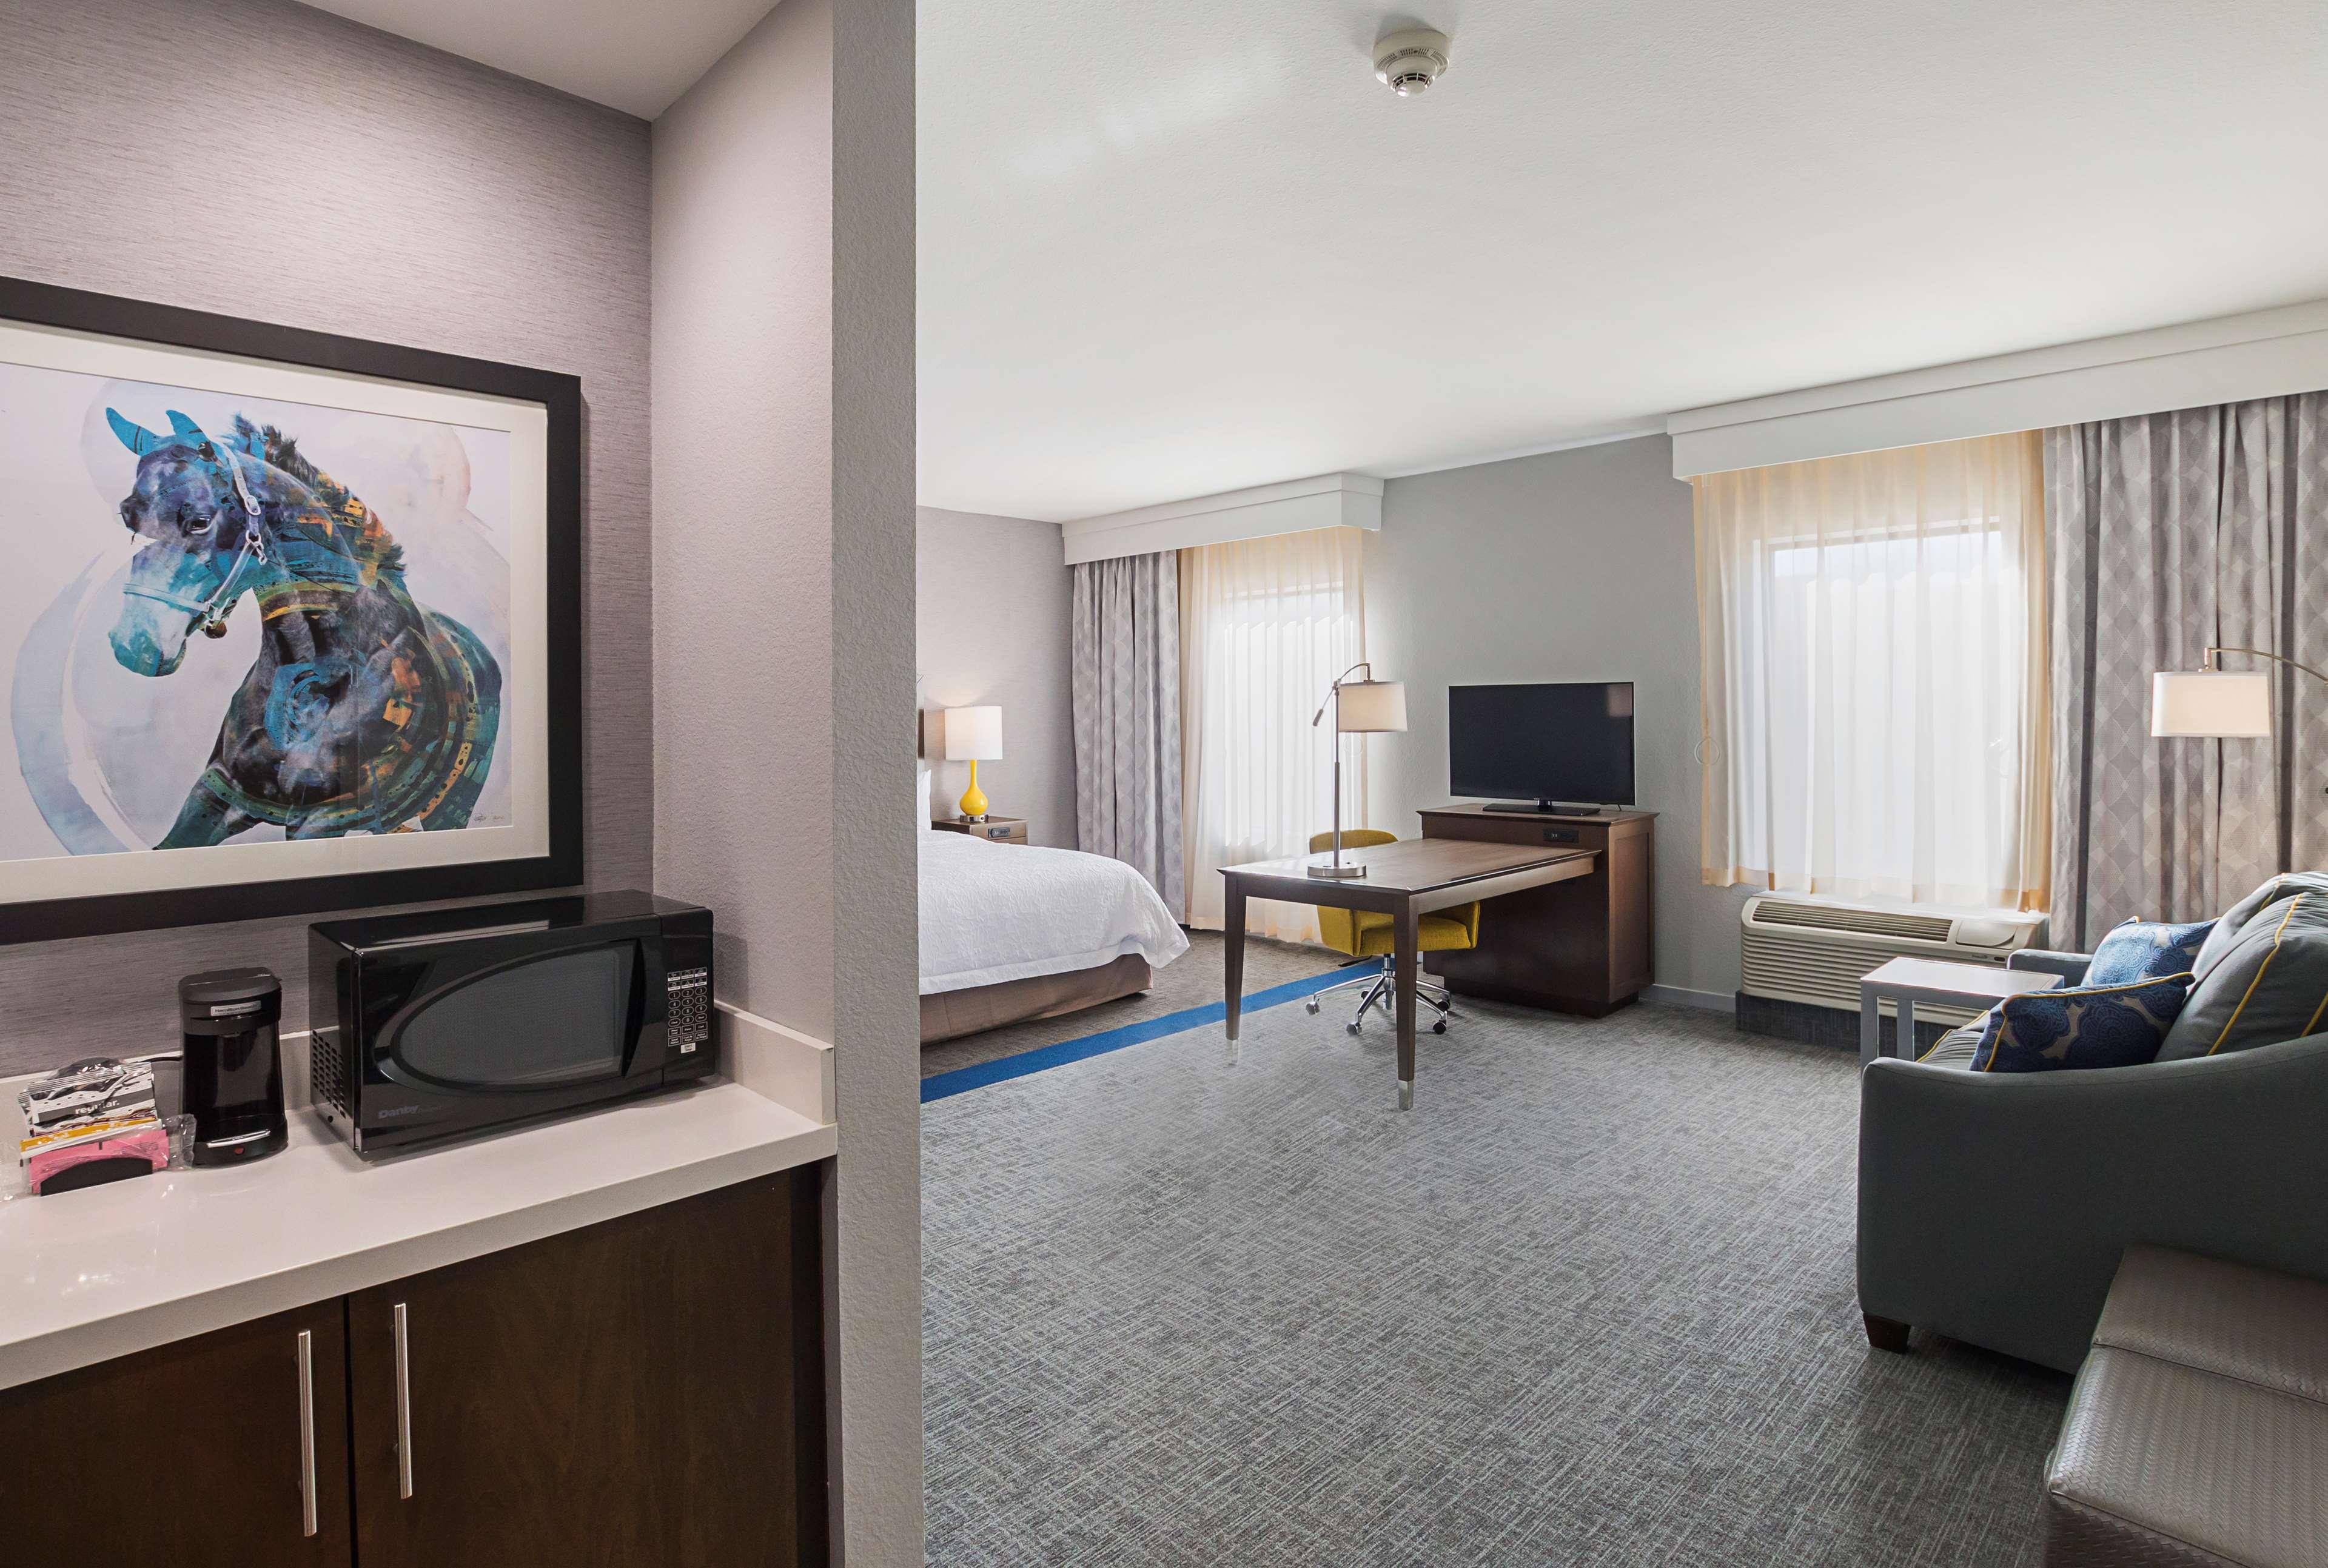 Hampton Inn & Suites Colleyville DFW West image 21